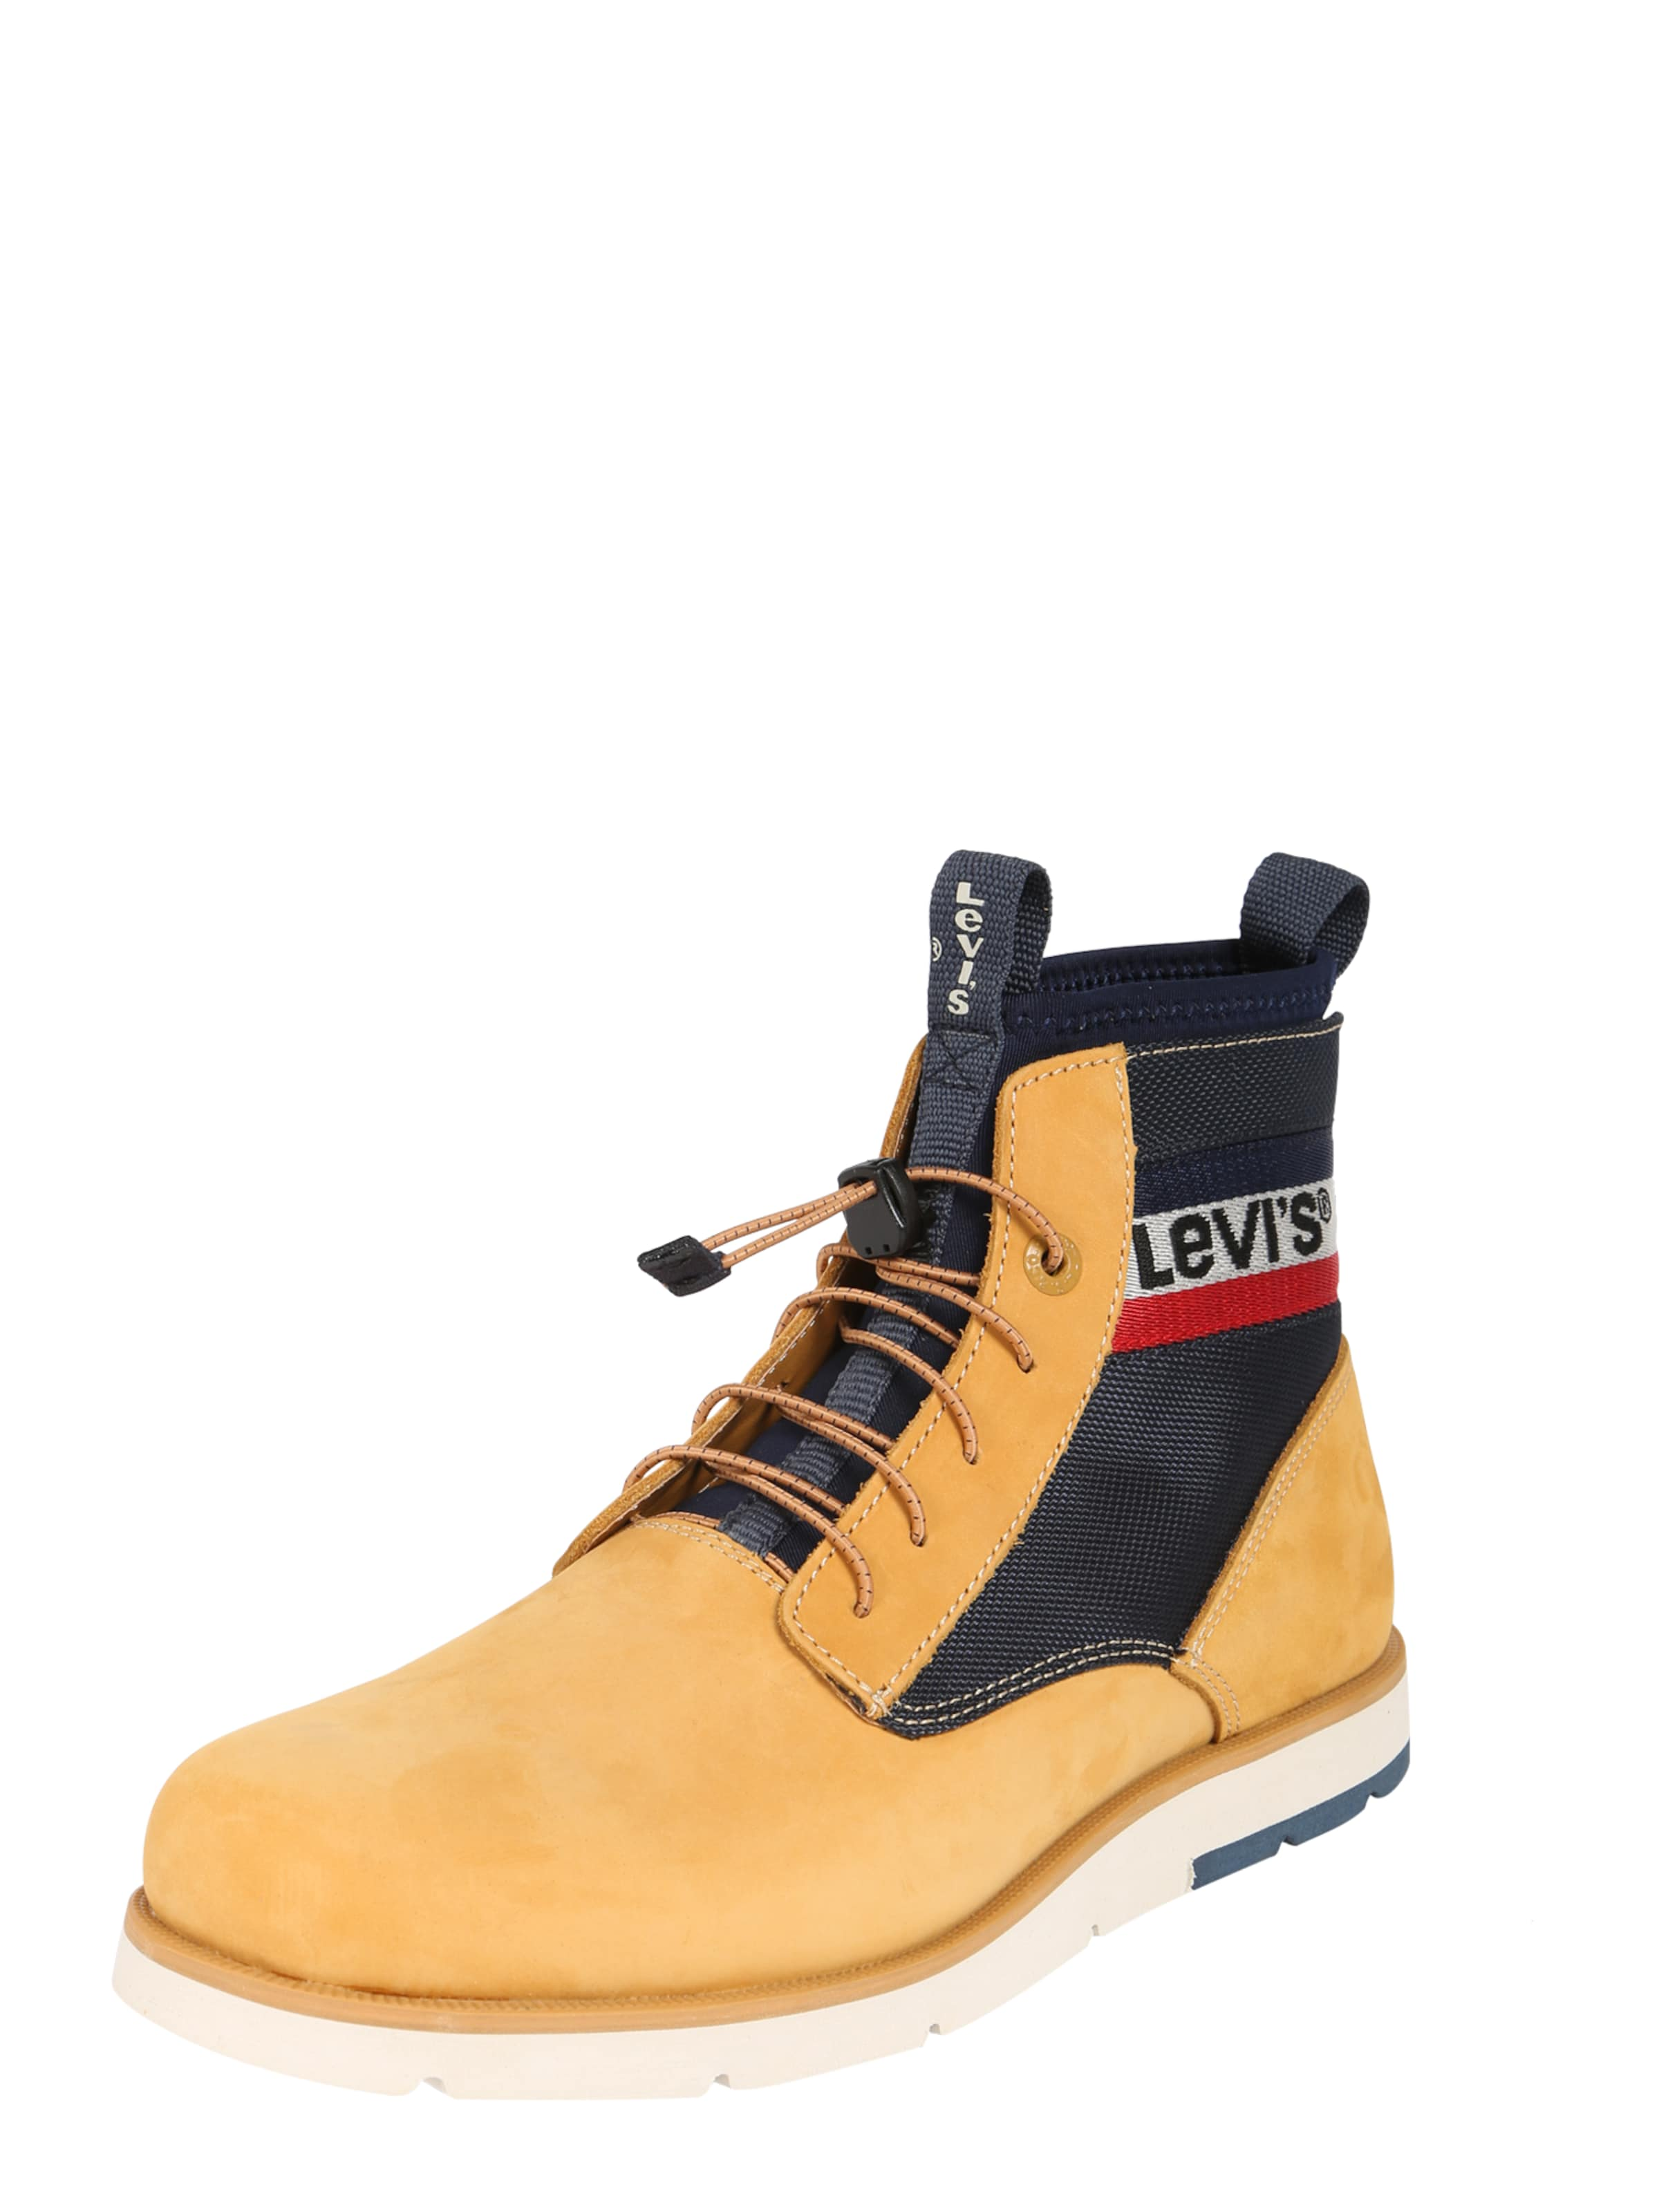 Stiefel Levi's Sportswear' 'jax HellbeigeSchwarz In Lite OZTPXukwi